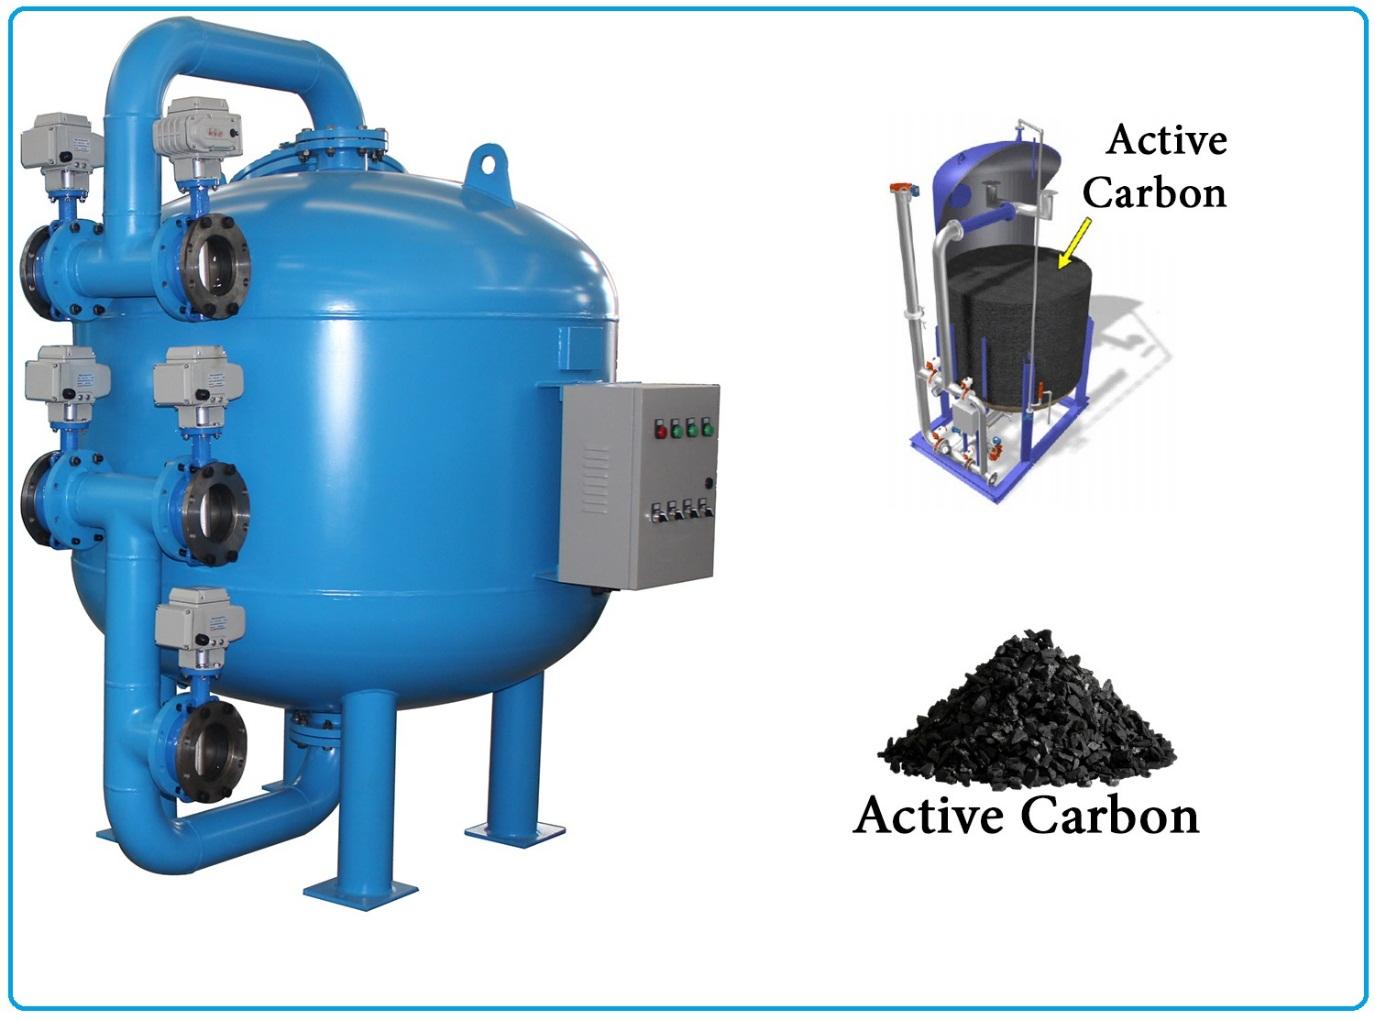 فیلتر کربنی